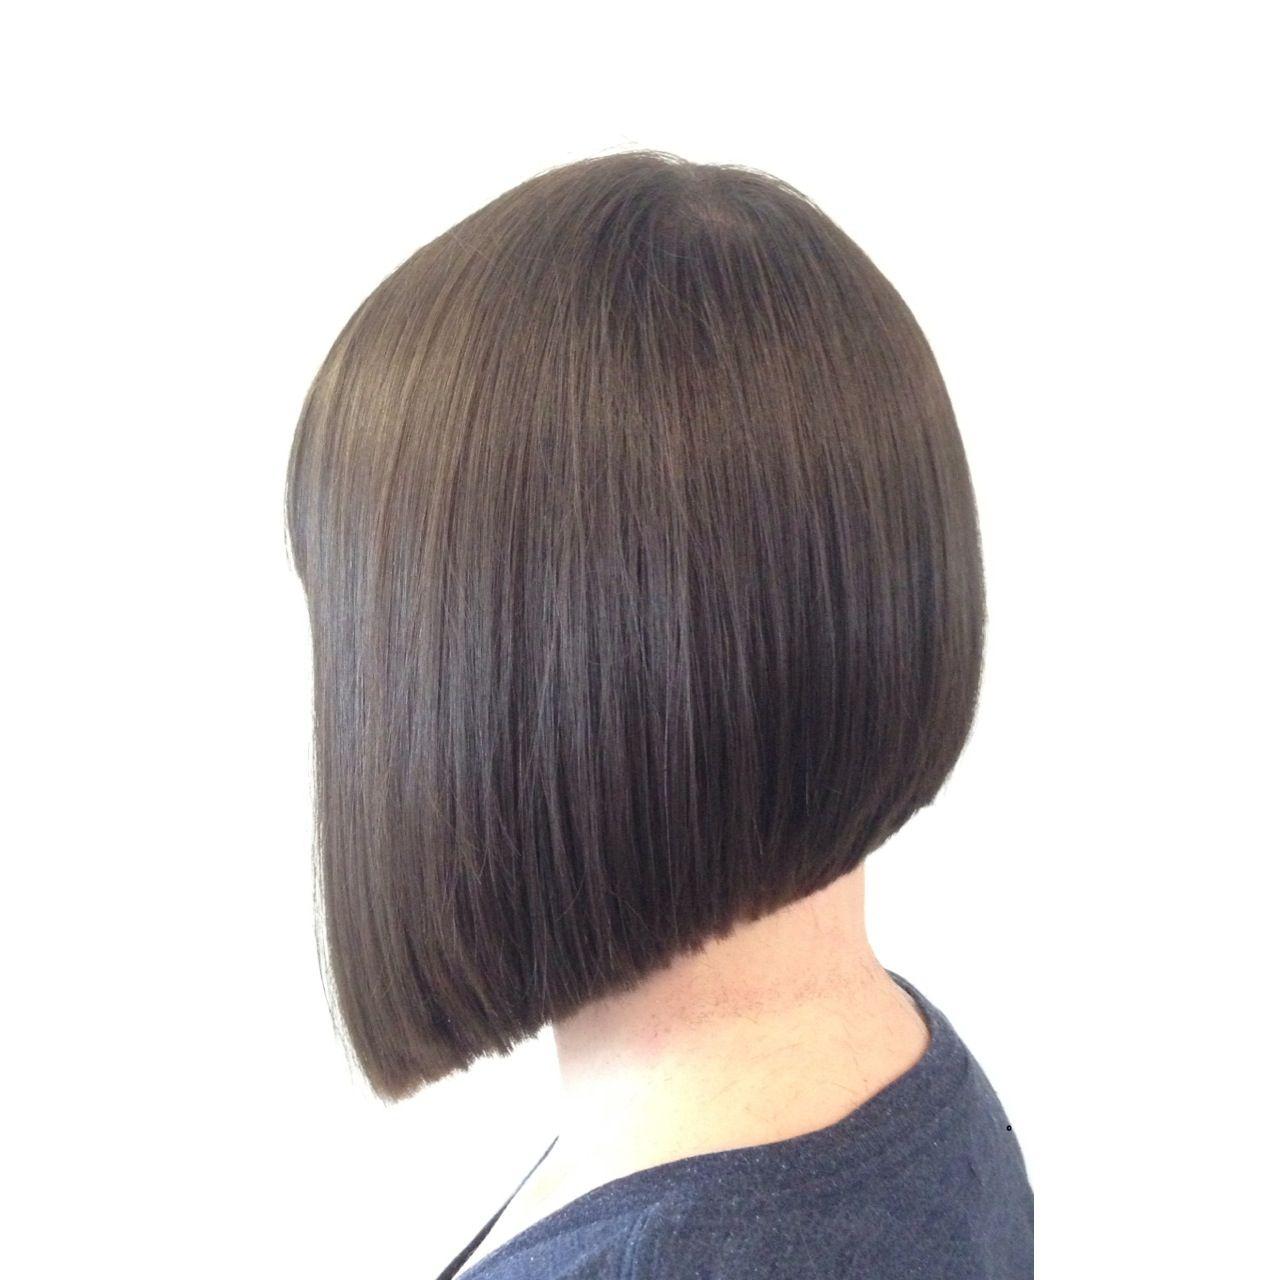 Triangular Graduation Or More Simply A Classic Bob One Length Haircuts One Length Hair Graduated Haircut